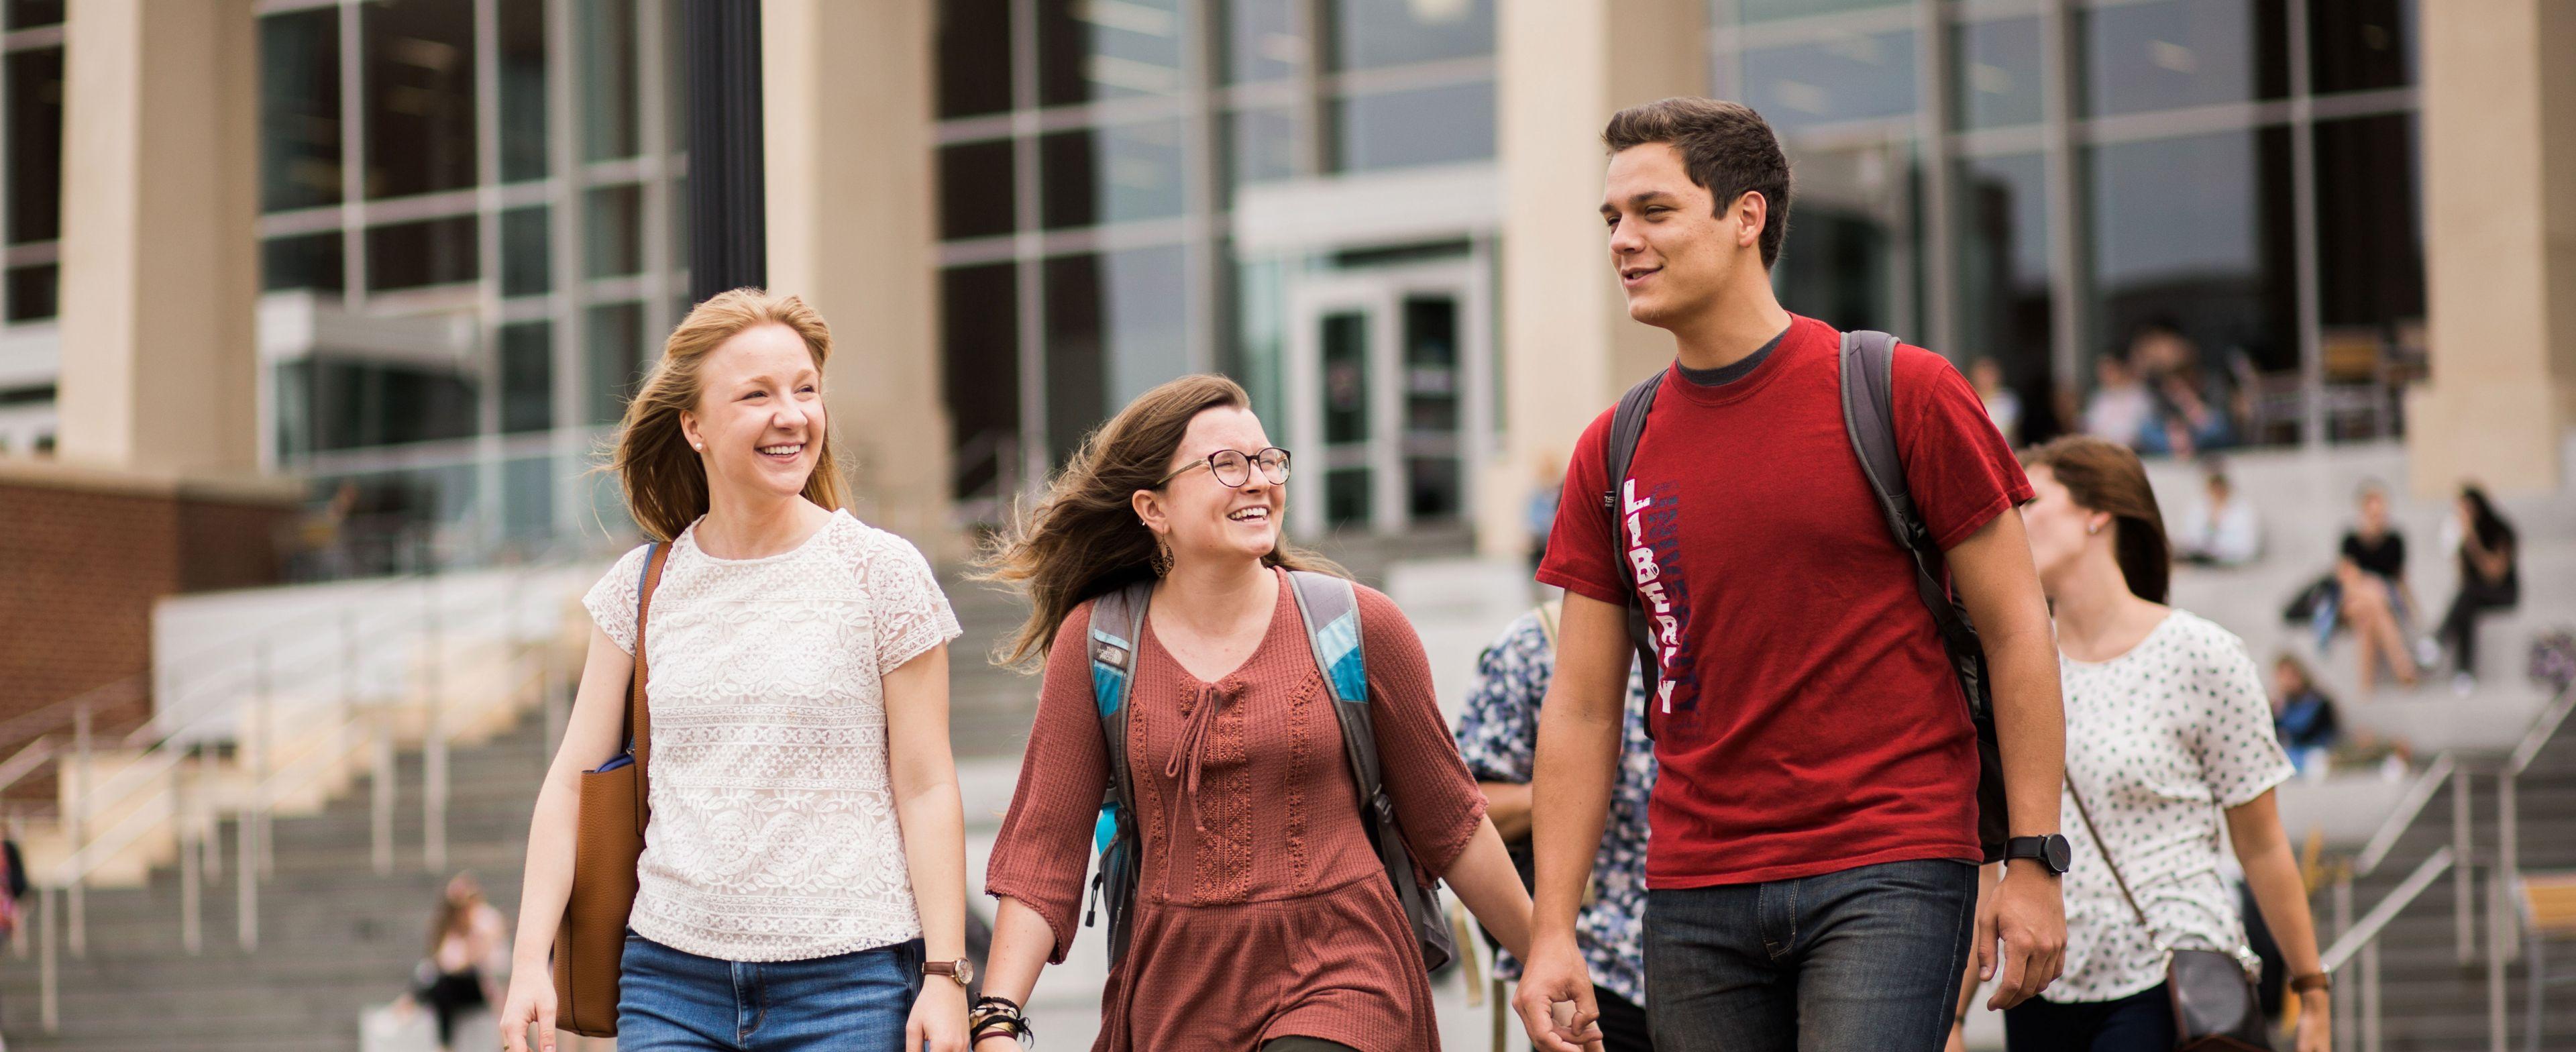 A,A, Interdisciplinary Studies Online Degree Program Page